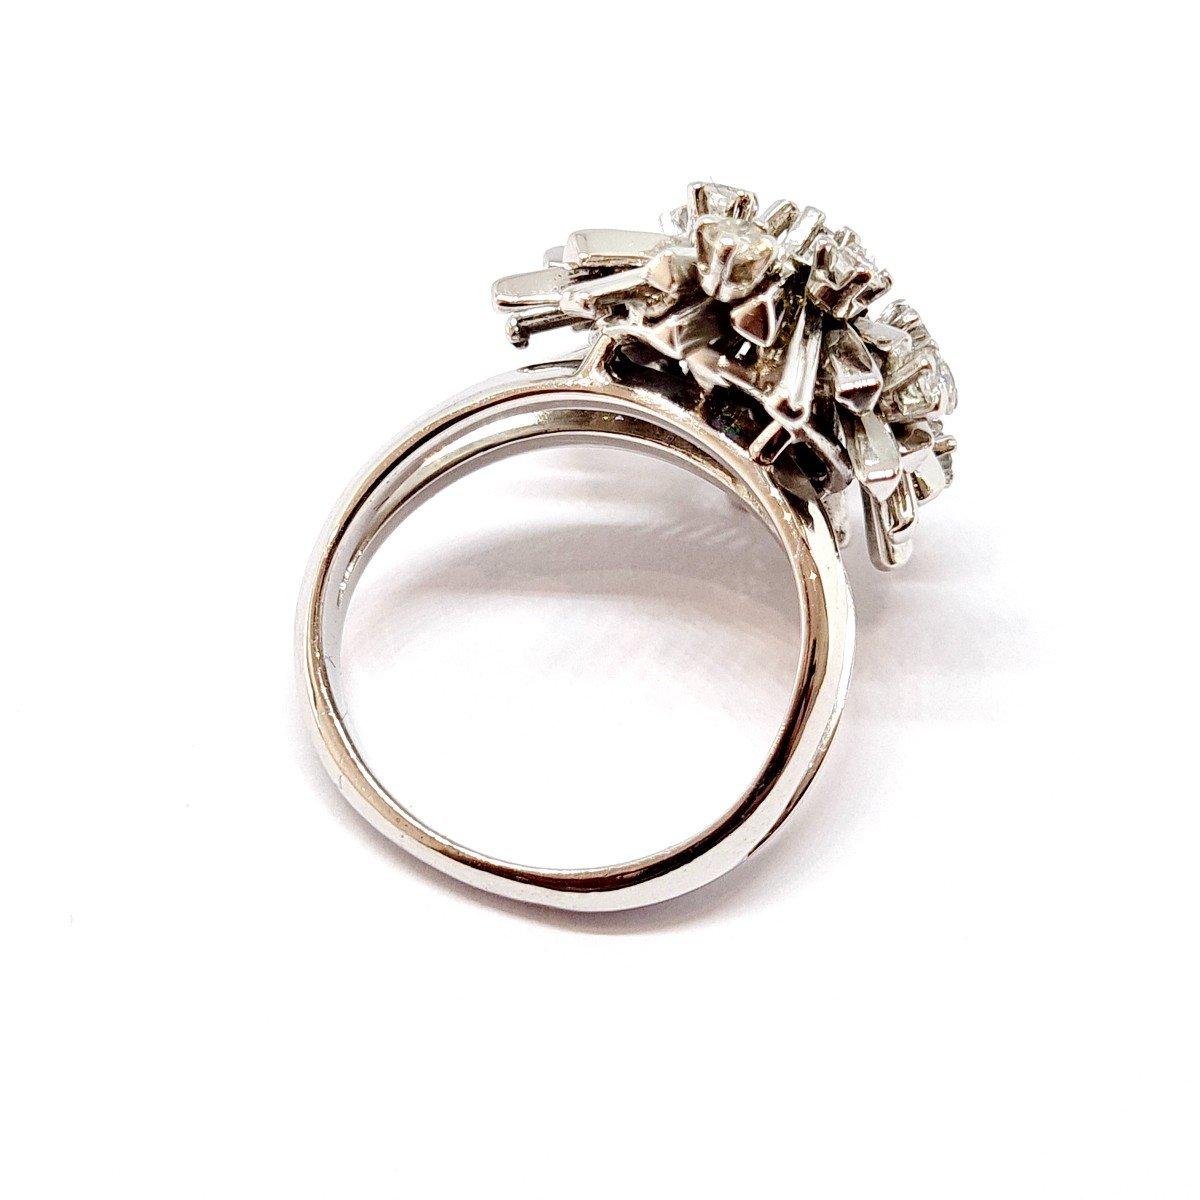 Bague Ancienne Or Blanc 18 Carats Diamants-photo-1